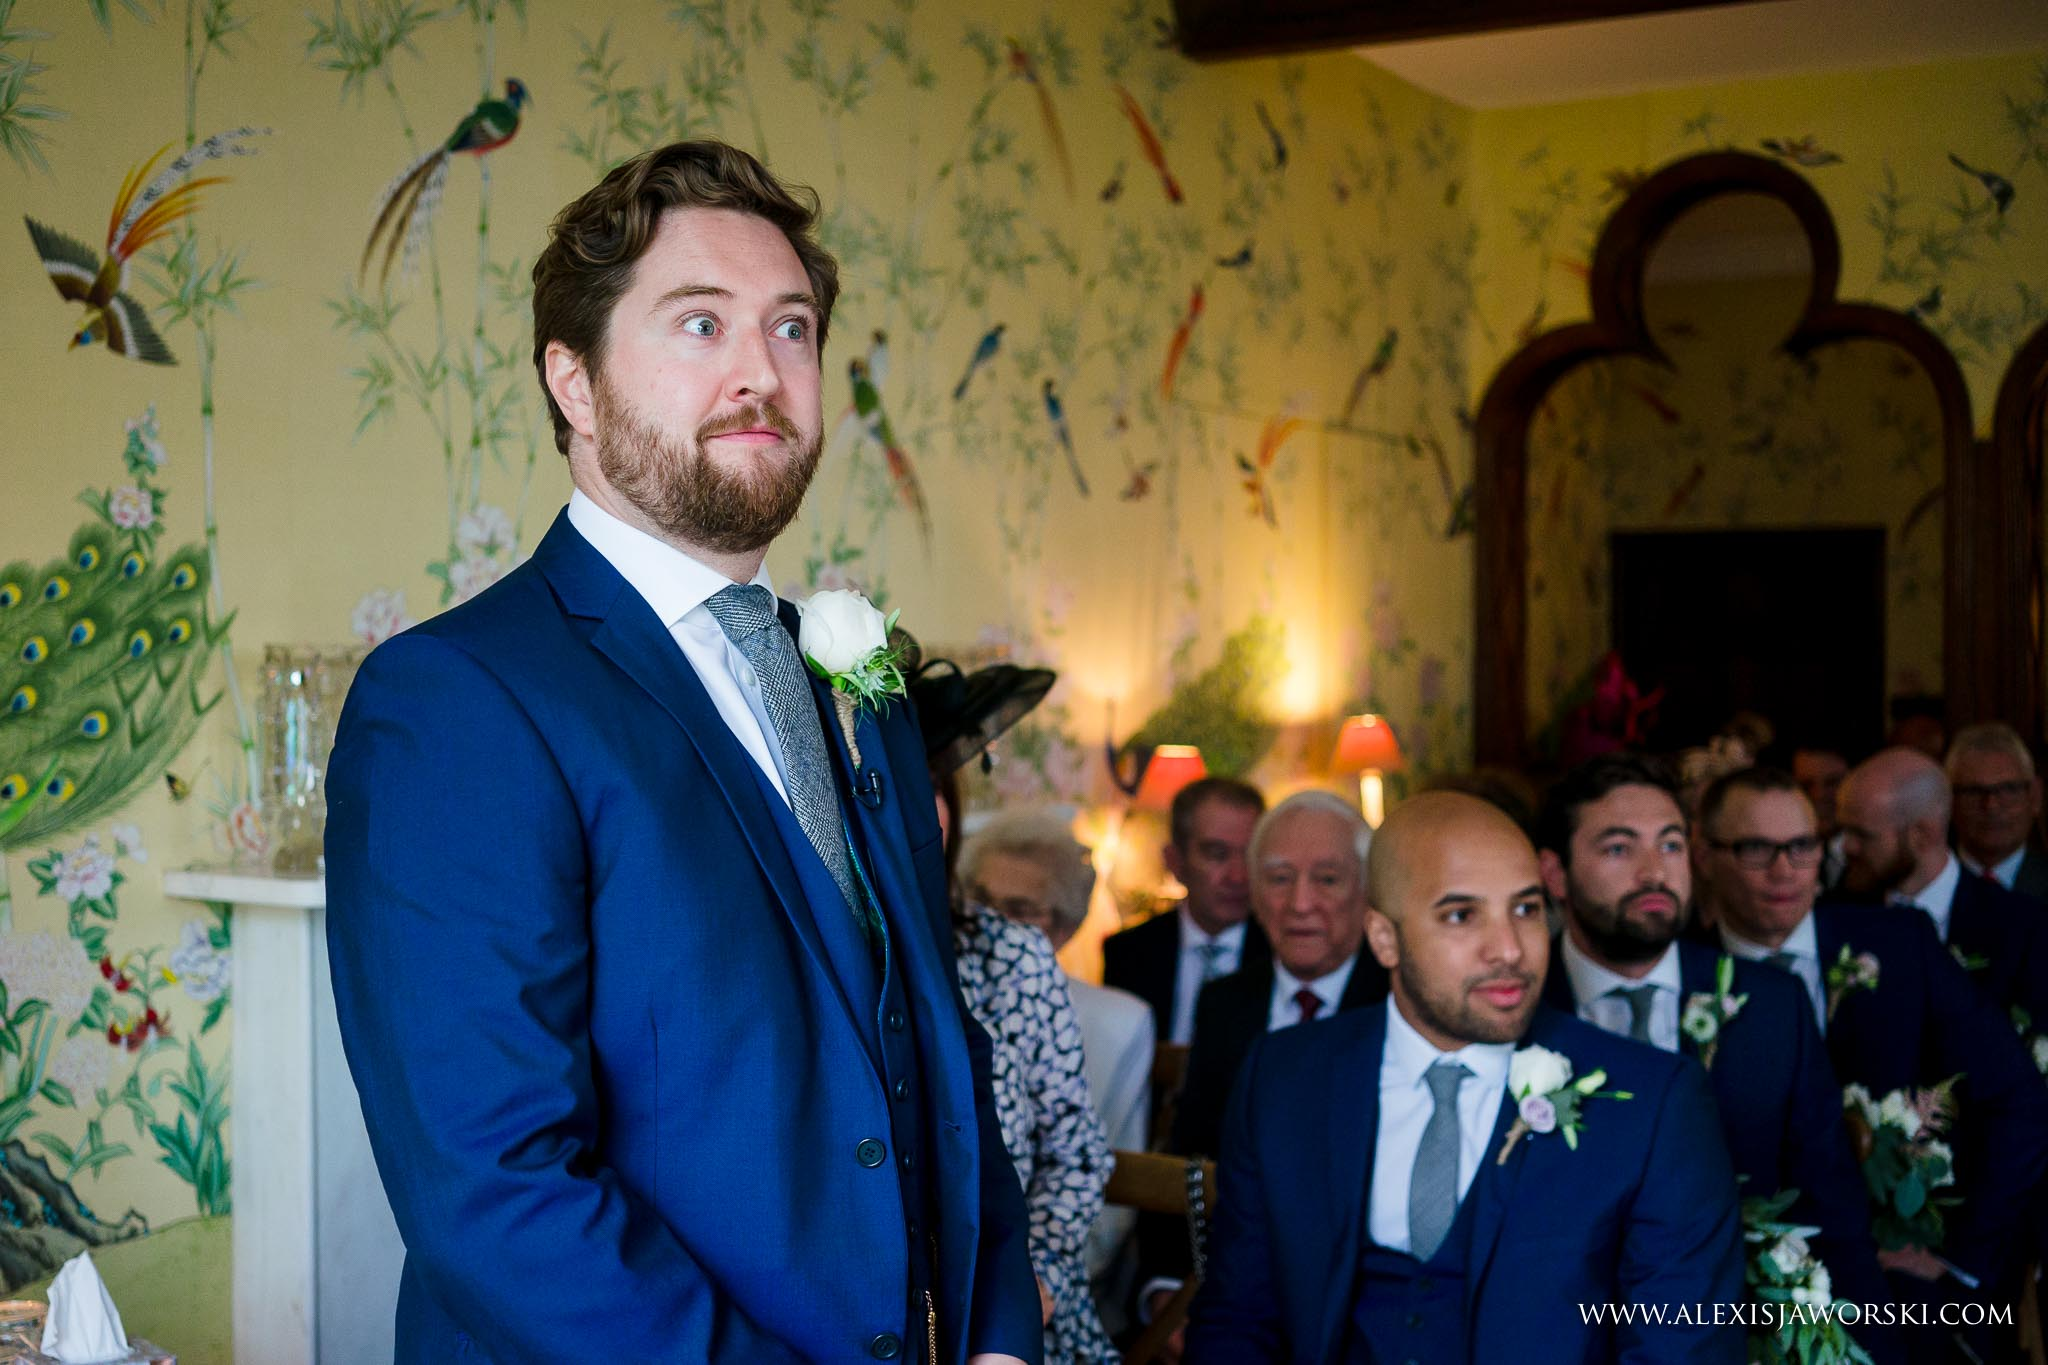 groom wiaiting for bride